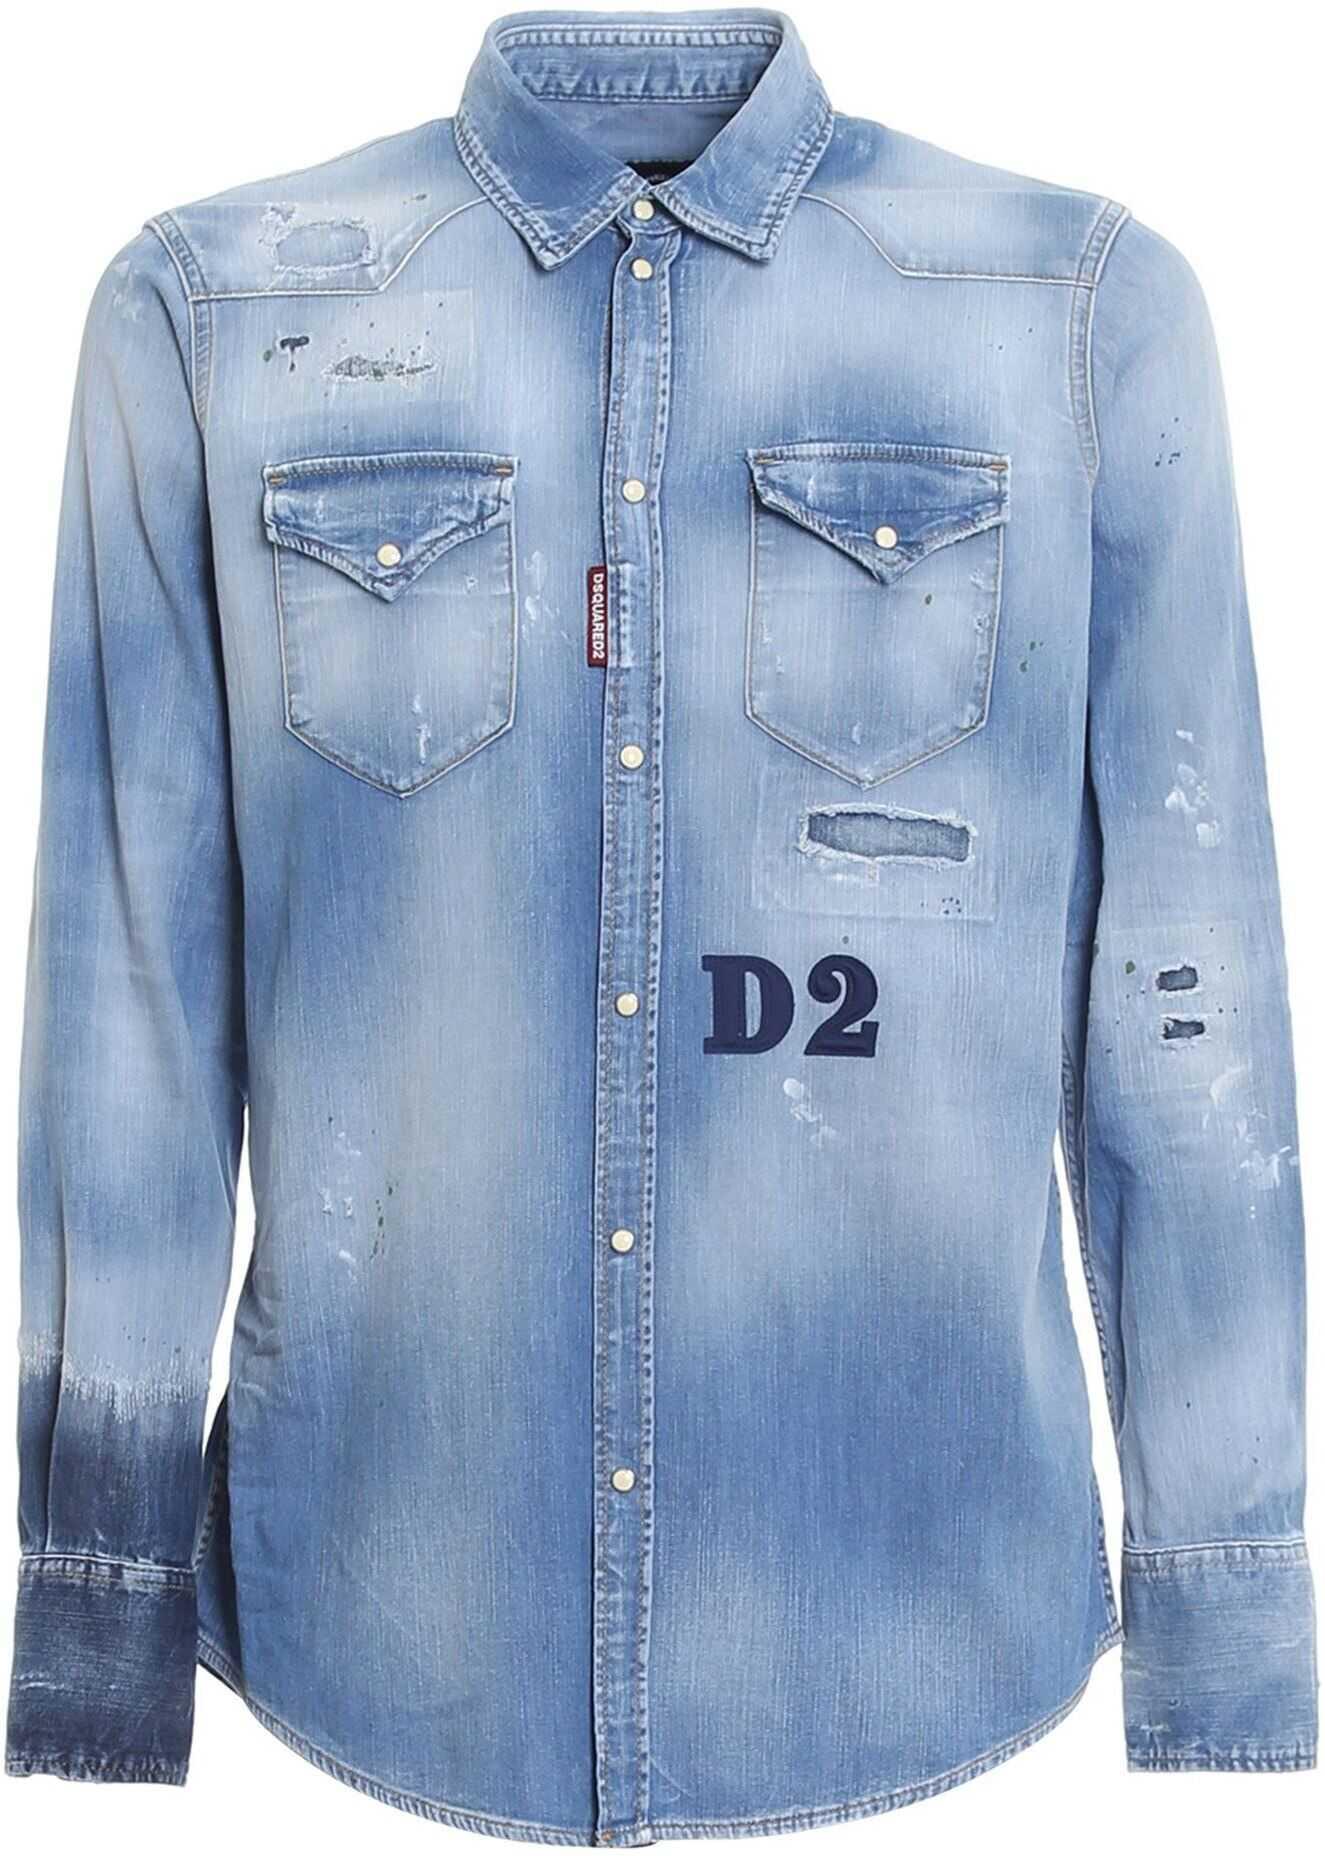 DSQUARED2 Distressed Effect Western Shirt In Light Blue Light Blue imagine